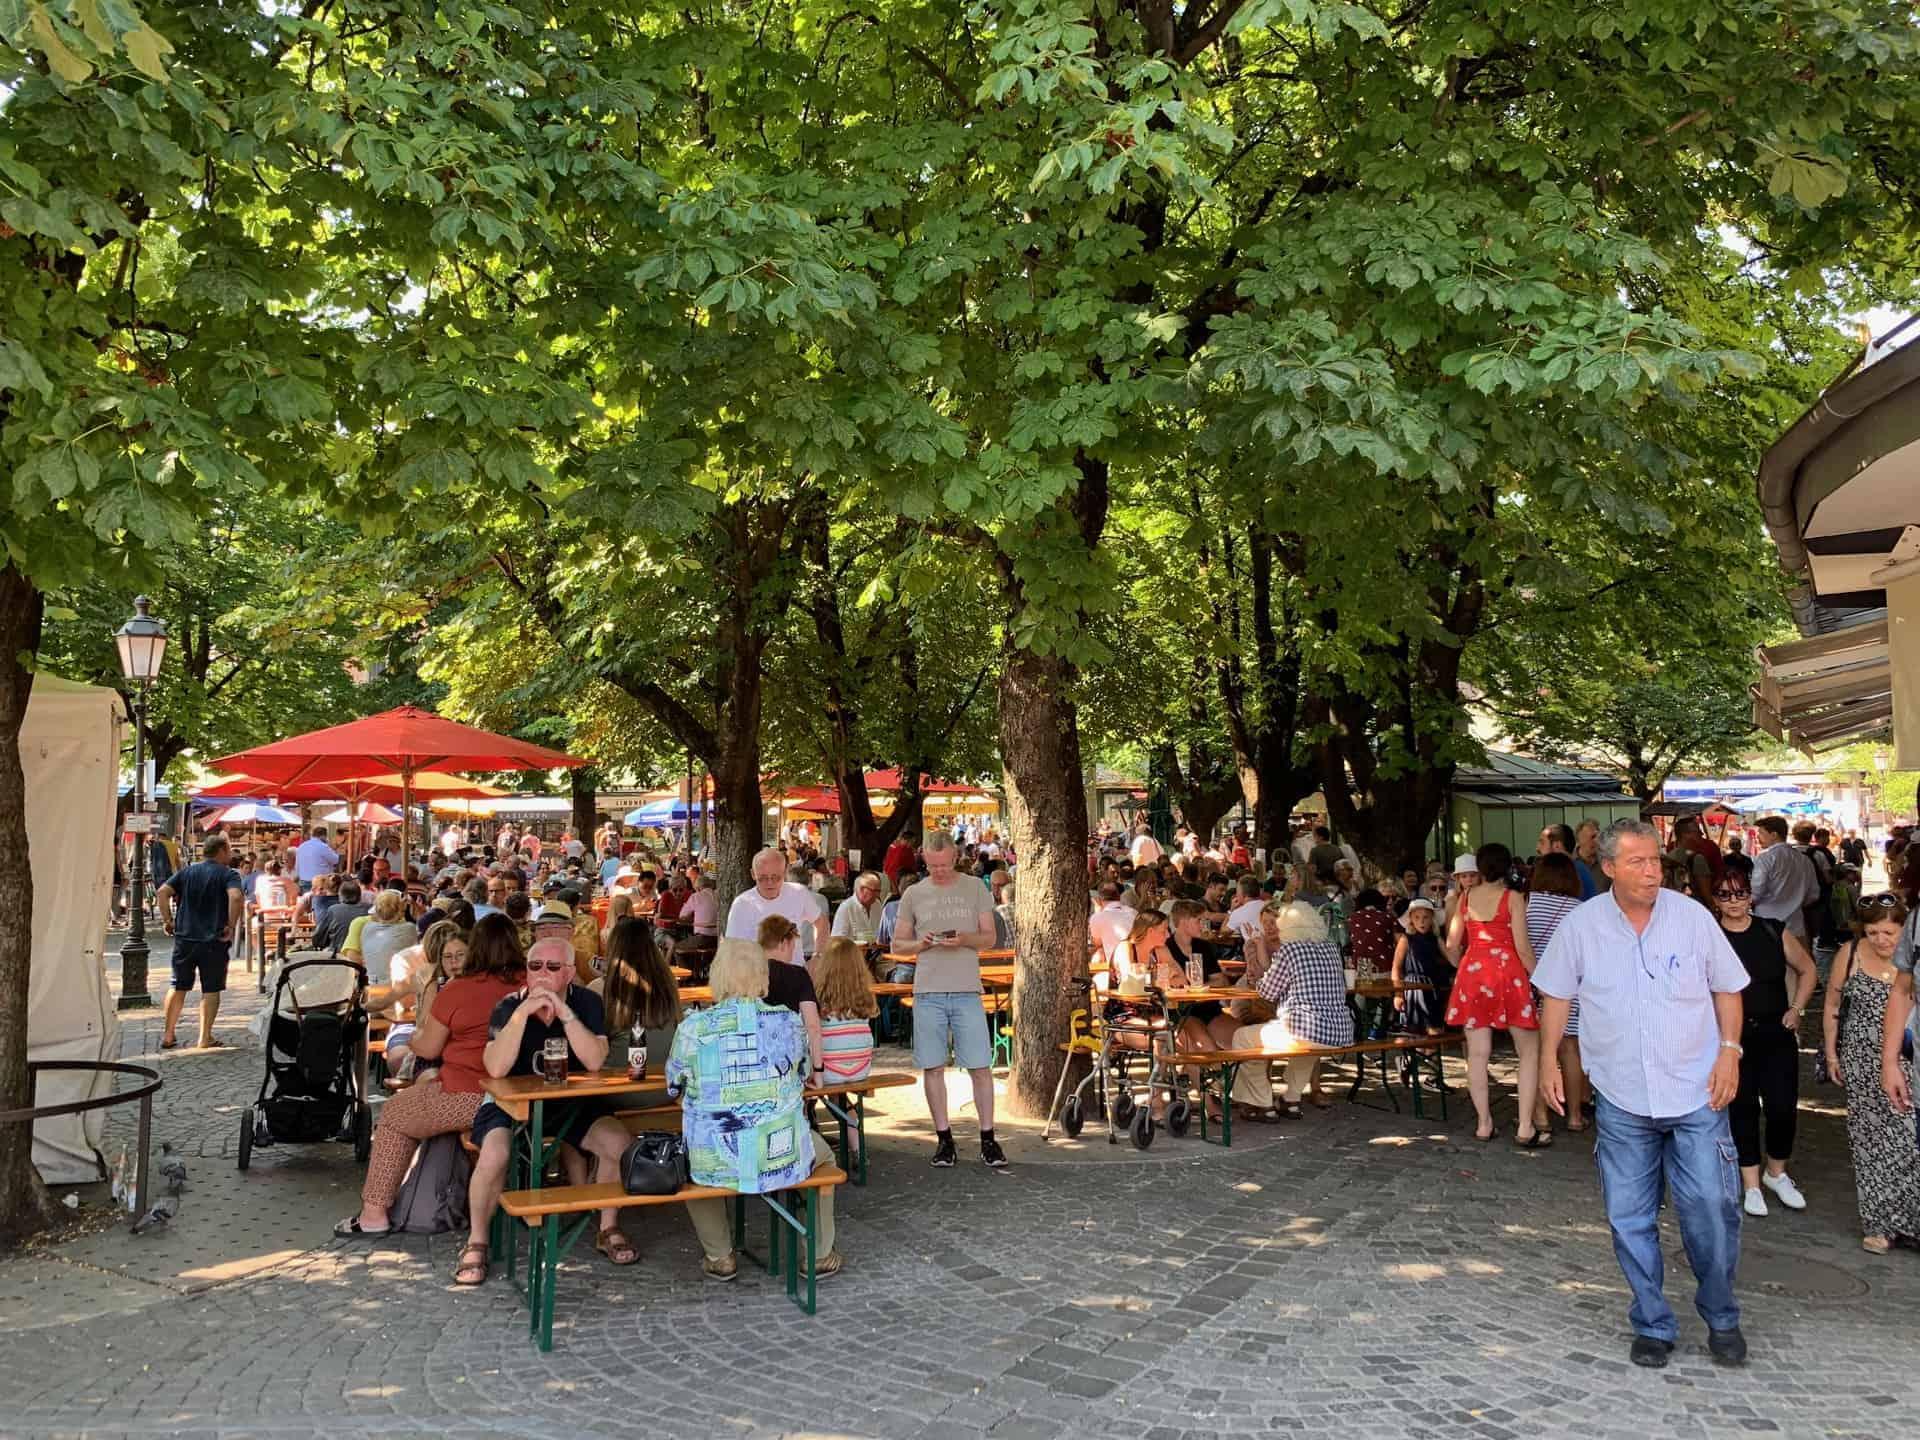 München_Viktualienmarkt_Biergarten